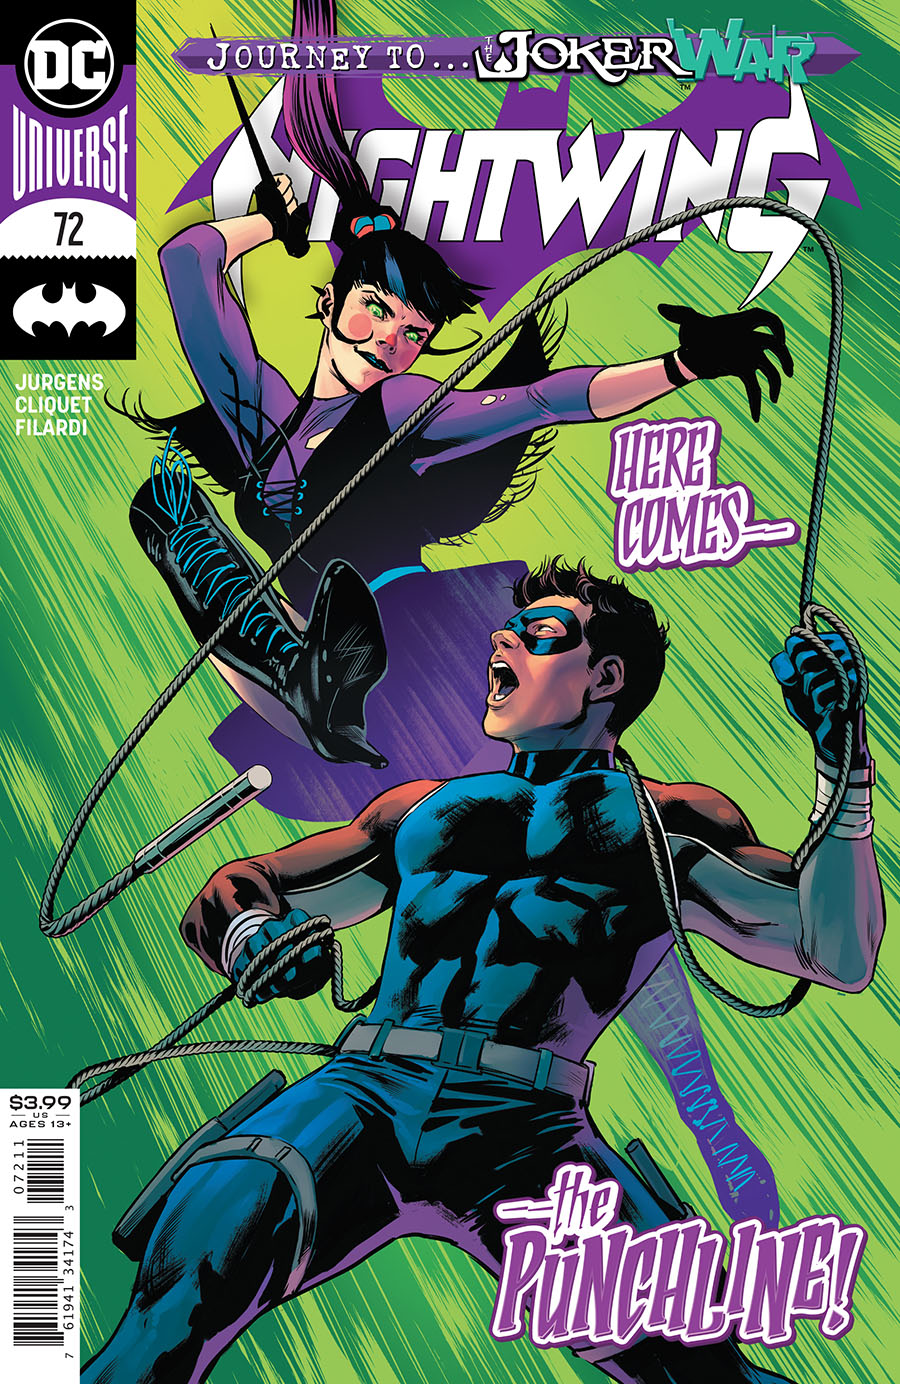 Nightwing Vol 4 #72 Cover A Regular Travis Moore Cover (Joker War Tie-In)